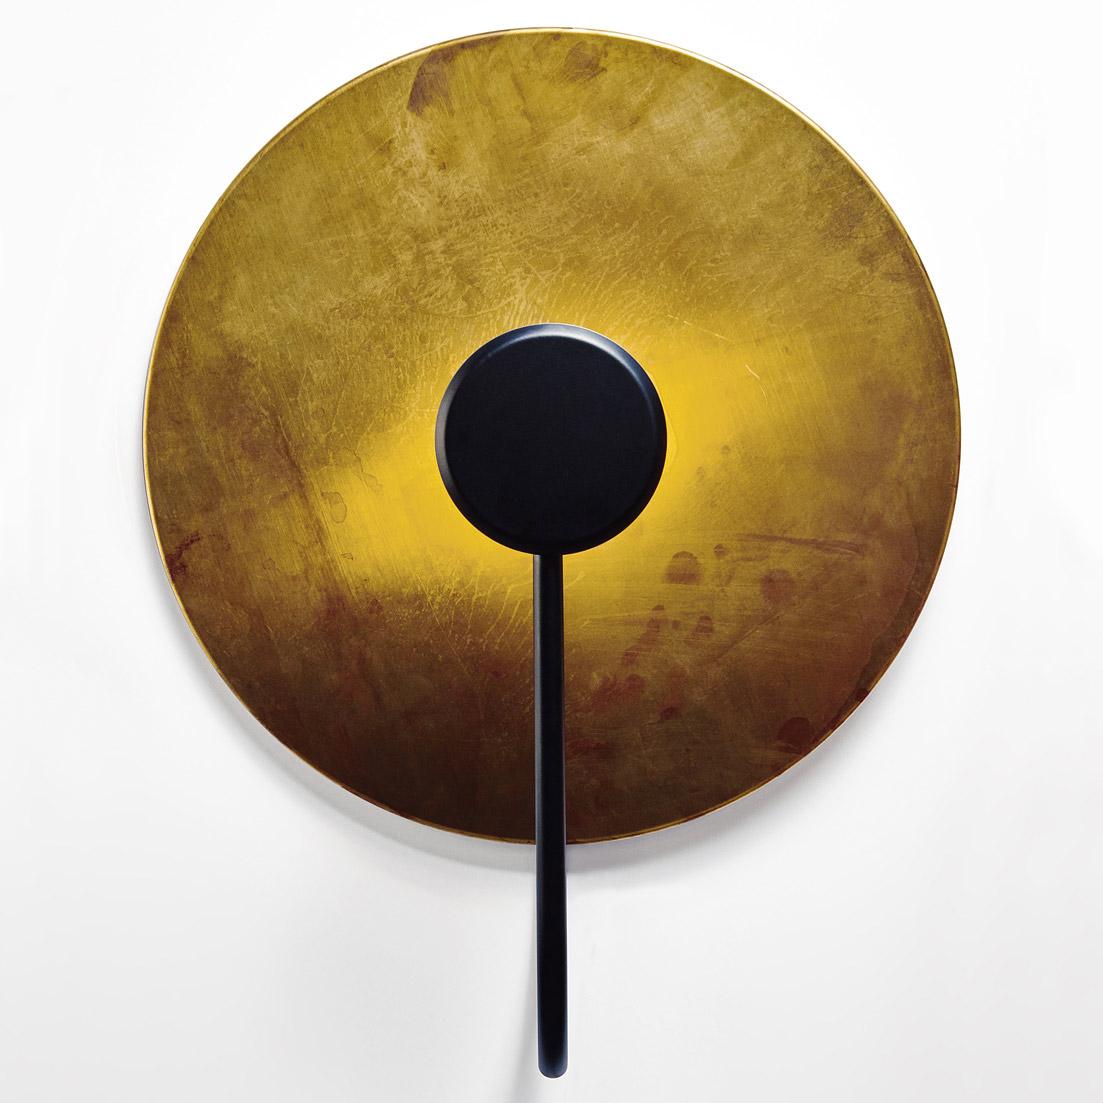 reflektierende wandleuchte mit gro er messingscheibe 40 90 cm casa lumi. Black Bedroom Furniture Sets. Home Design Ideas